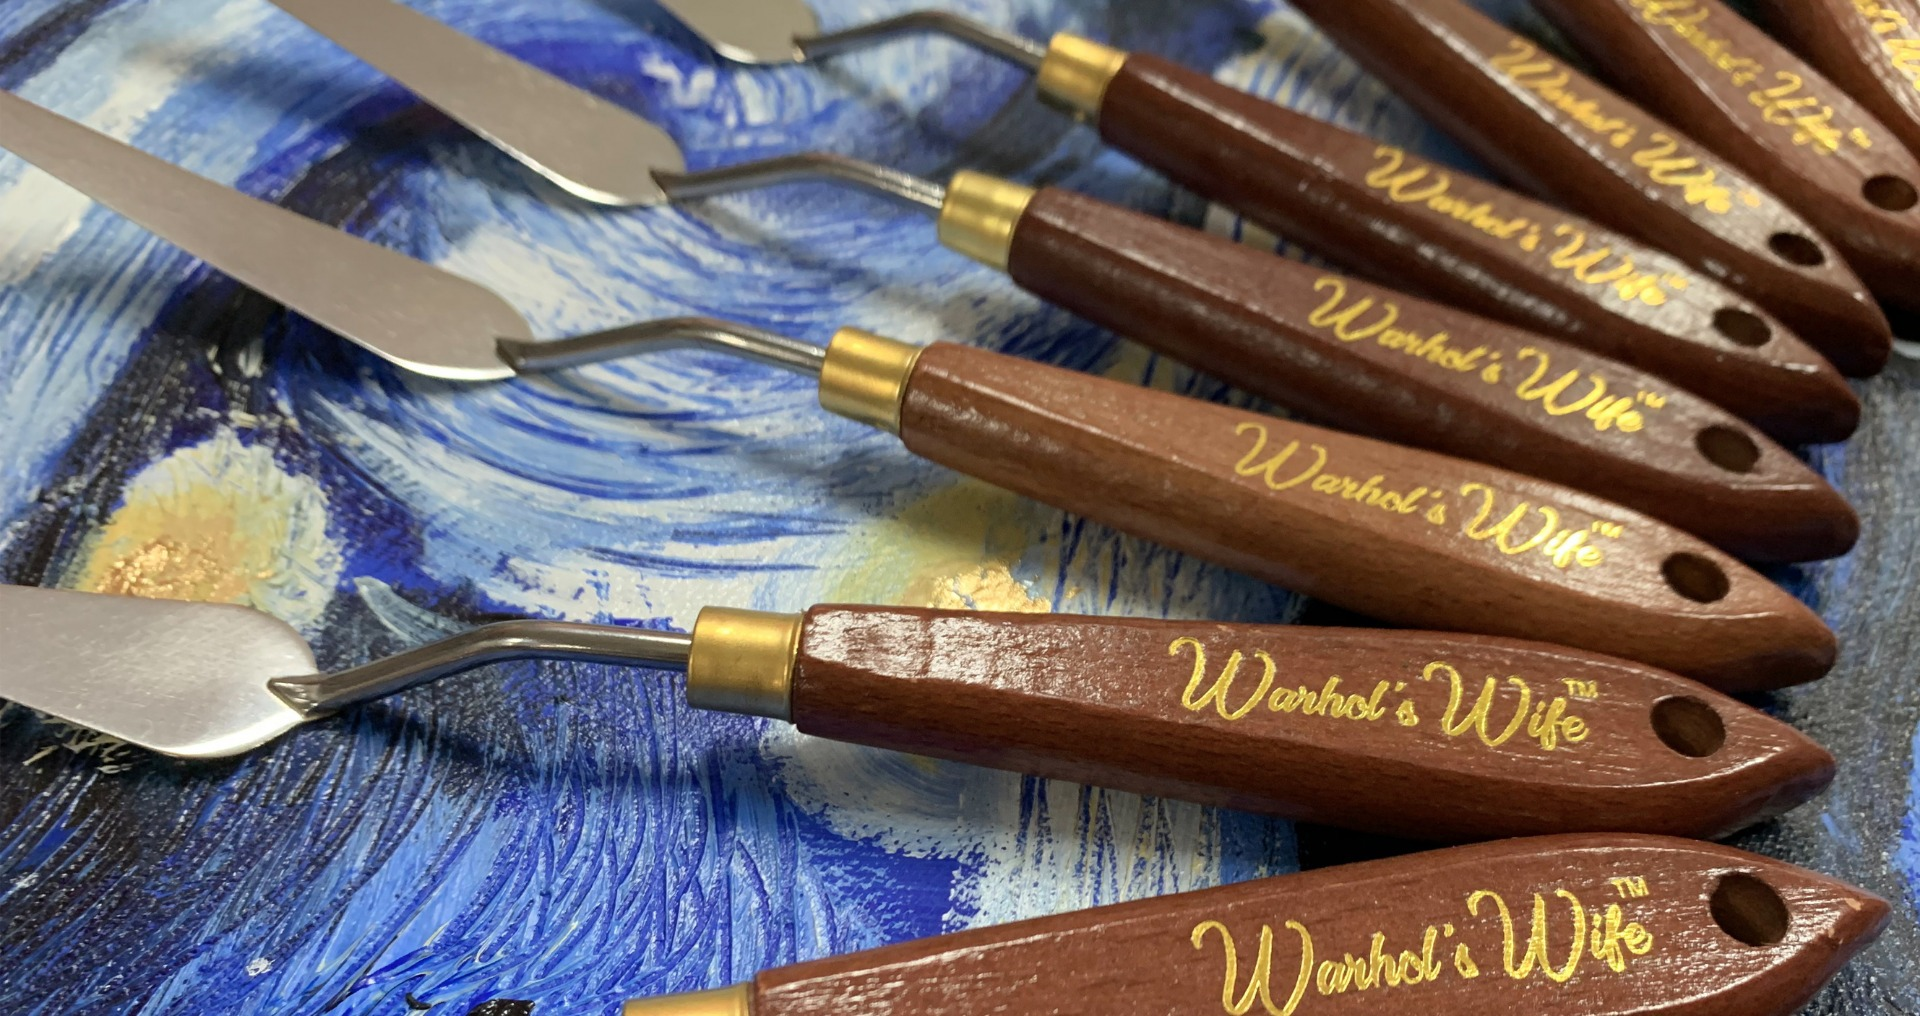 Warhol's Wife Palette Knife Set